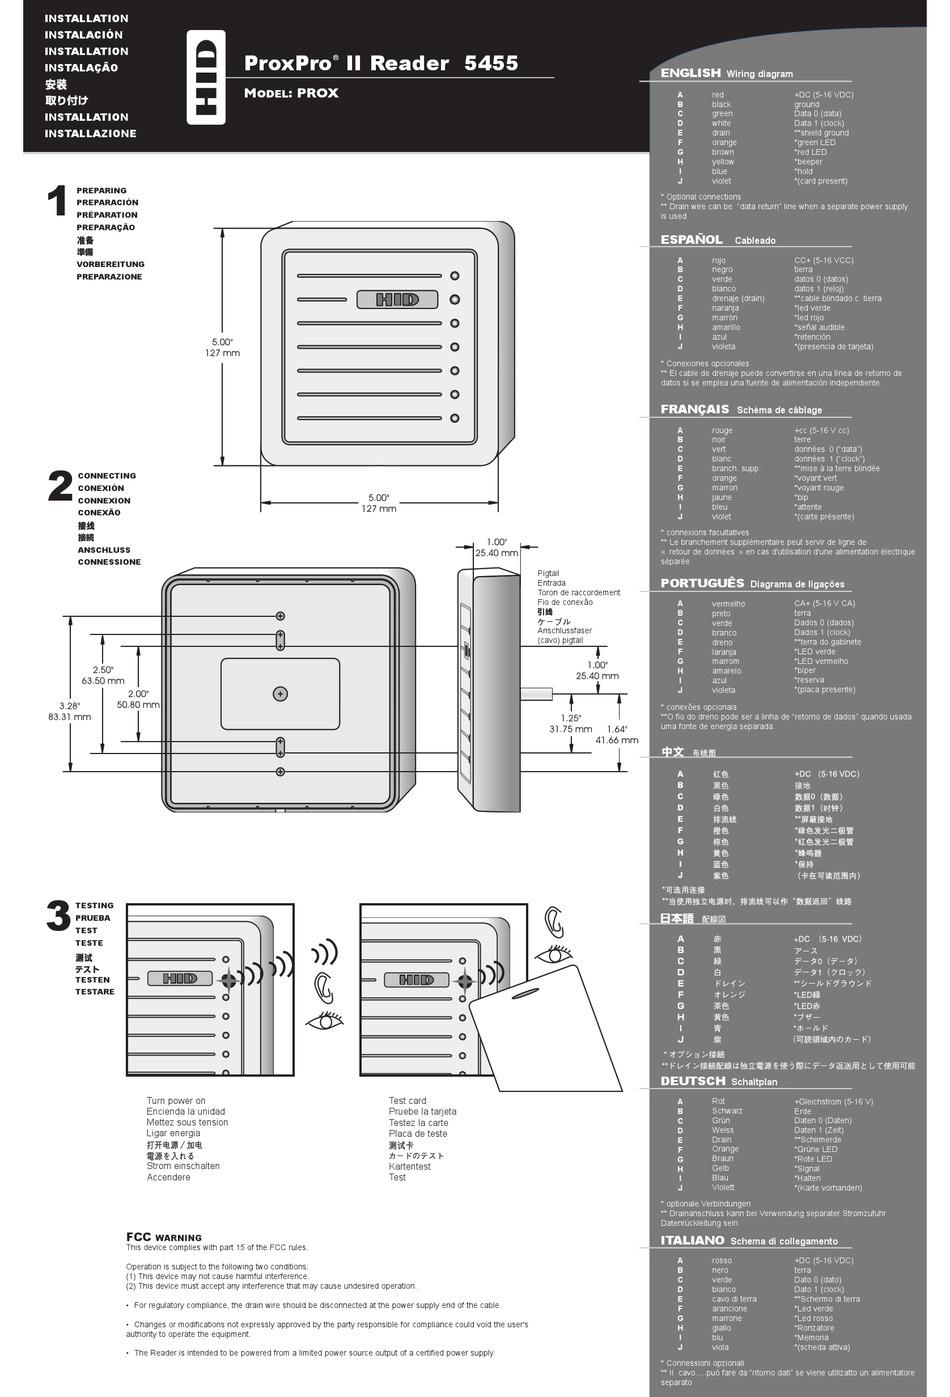 HID PROXPRO II 5455 INSTALLATION MANUAL Pdf Download | ManualsLib | Proxpro Hid Wiring Diagram |  | ManualsLib